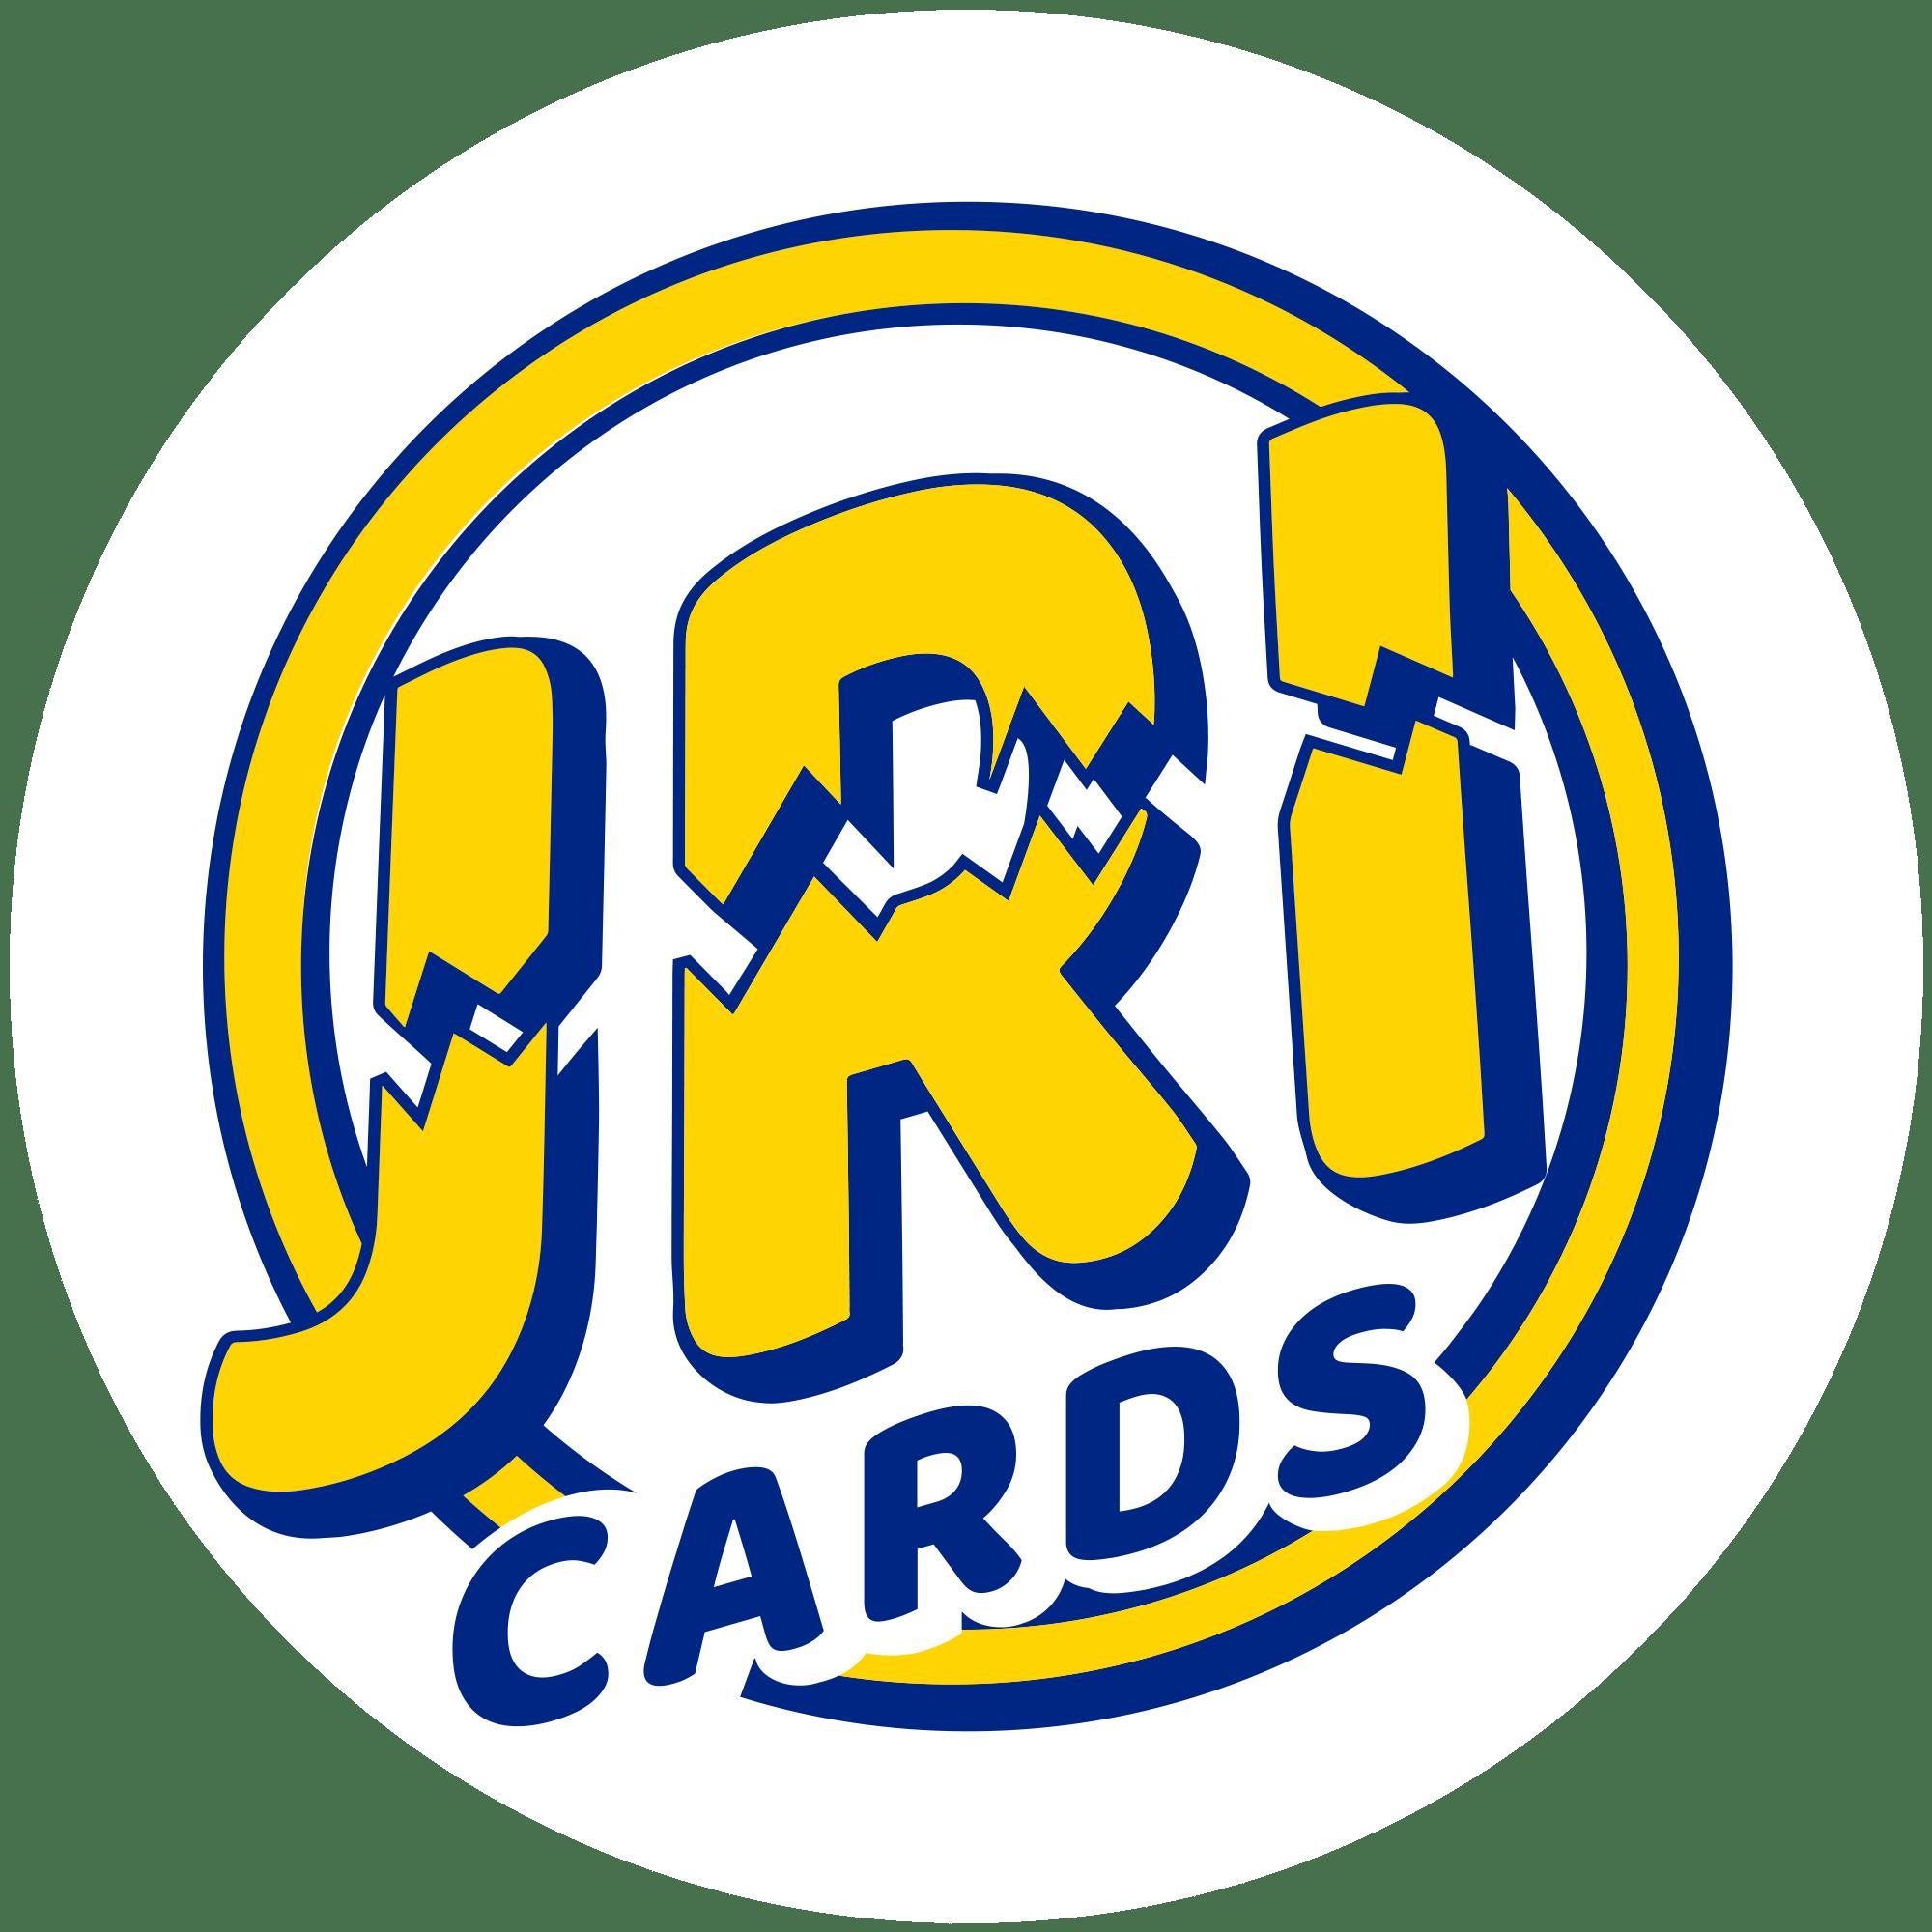 2018 PANINI DONRUSS OPTIC BASKETBALL HOBBY BOX (20 PACKS AVAILABLE)